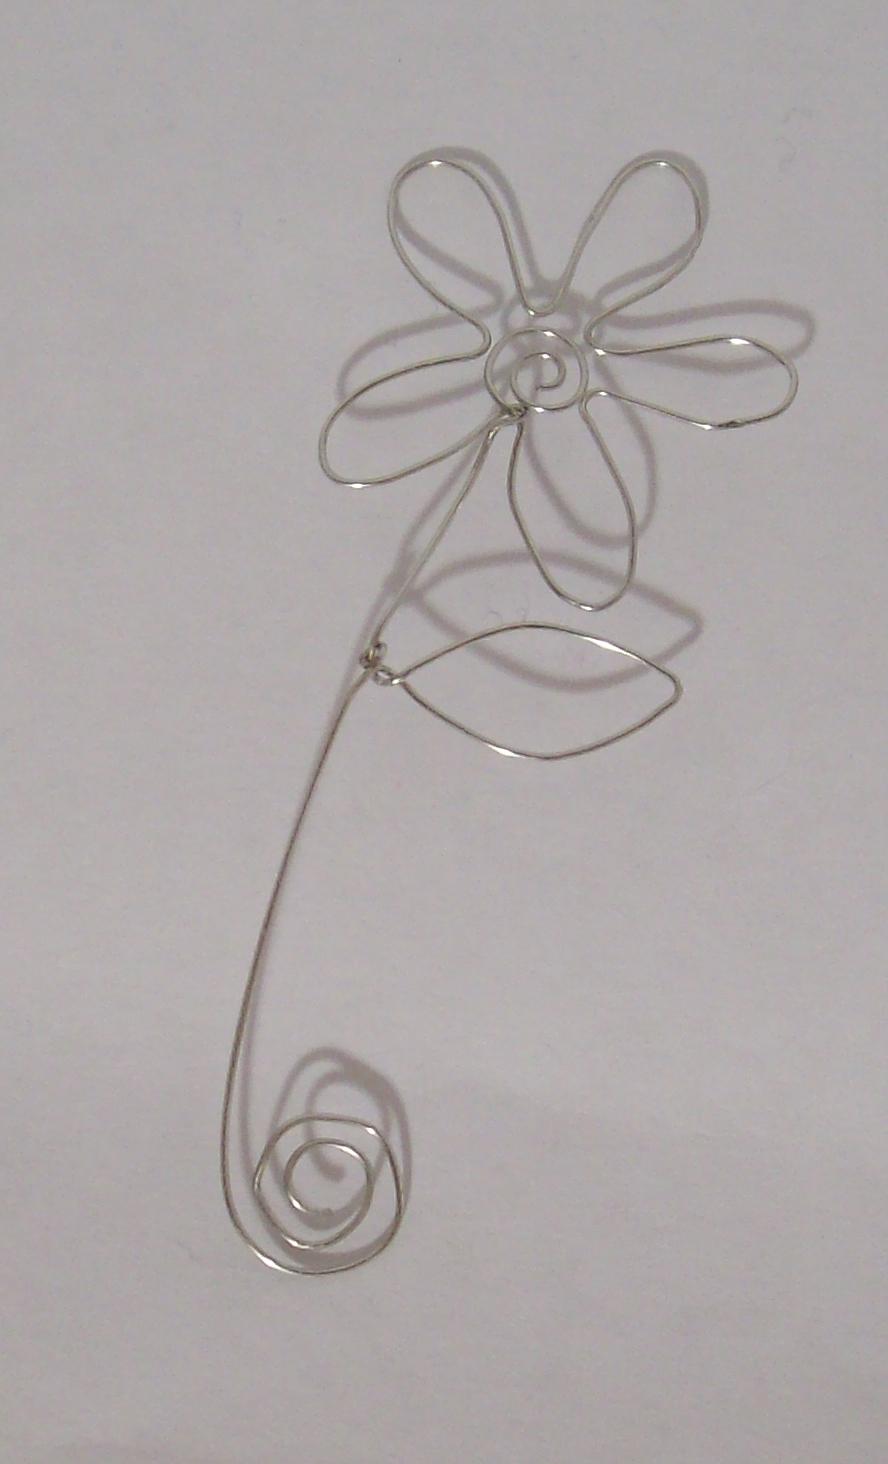 Wire Flower By Zaphod Beeblebroxie On DeviantArt